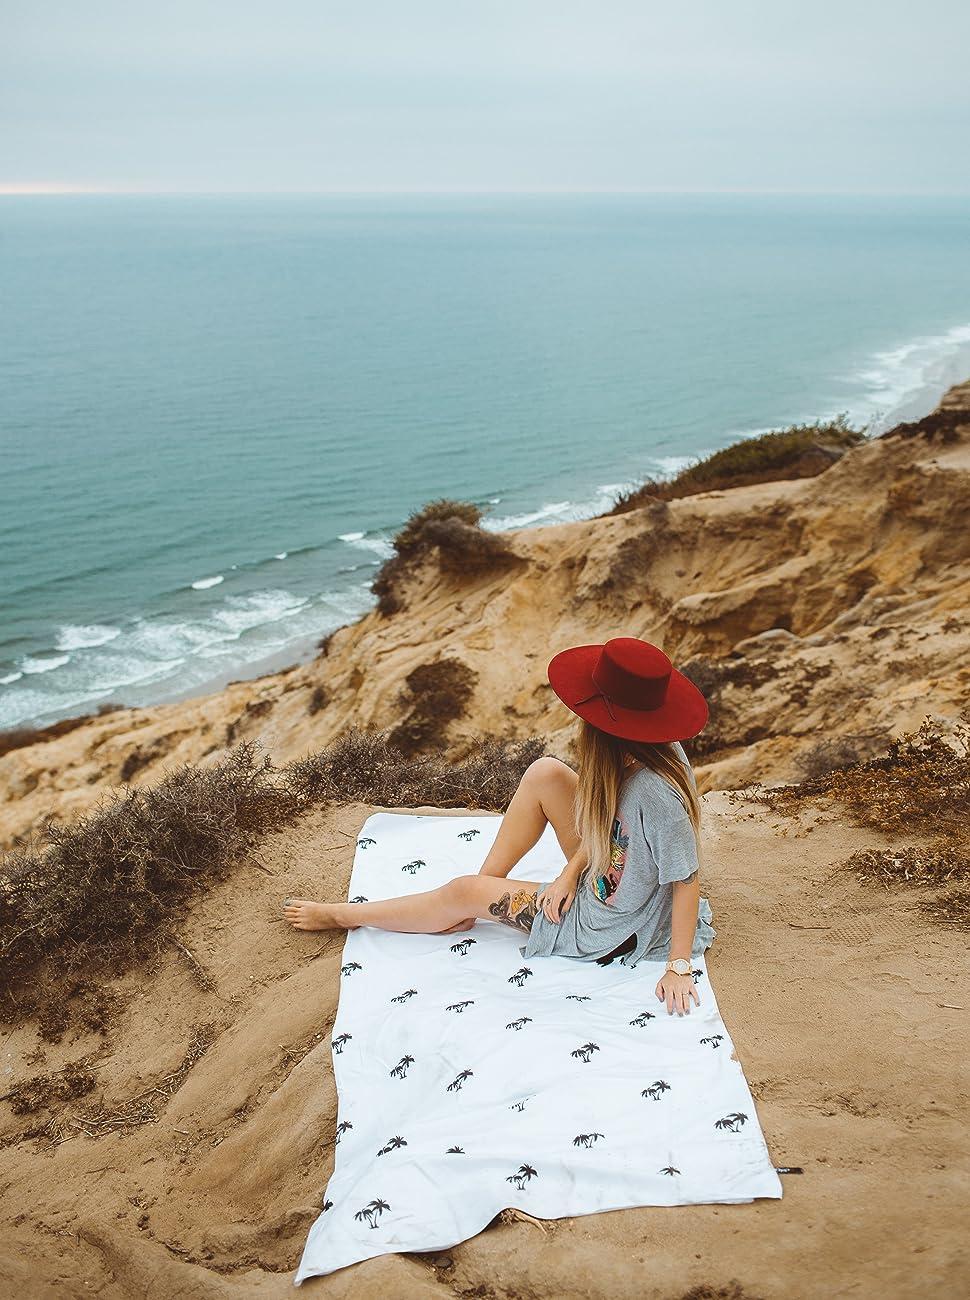 Lytepark Microfiber Beach Towel Extra LARGE XL /& Oversized Quick Dry Lightweight